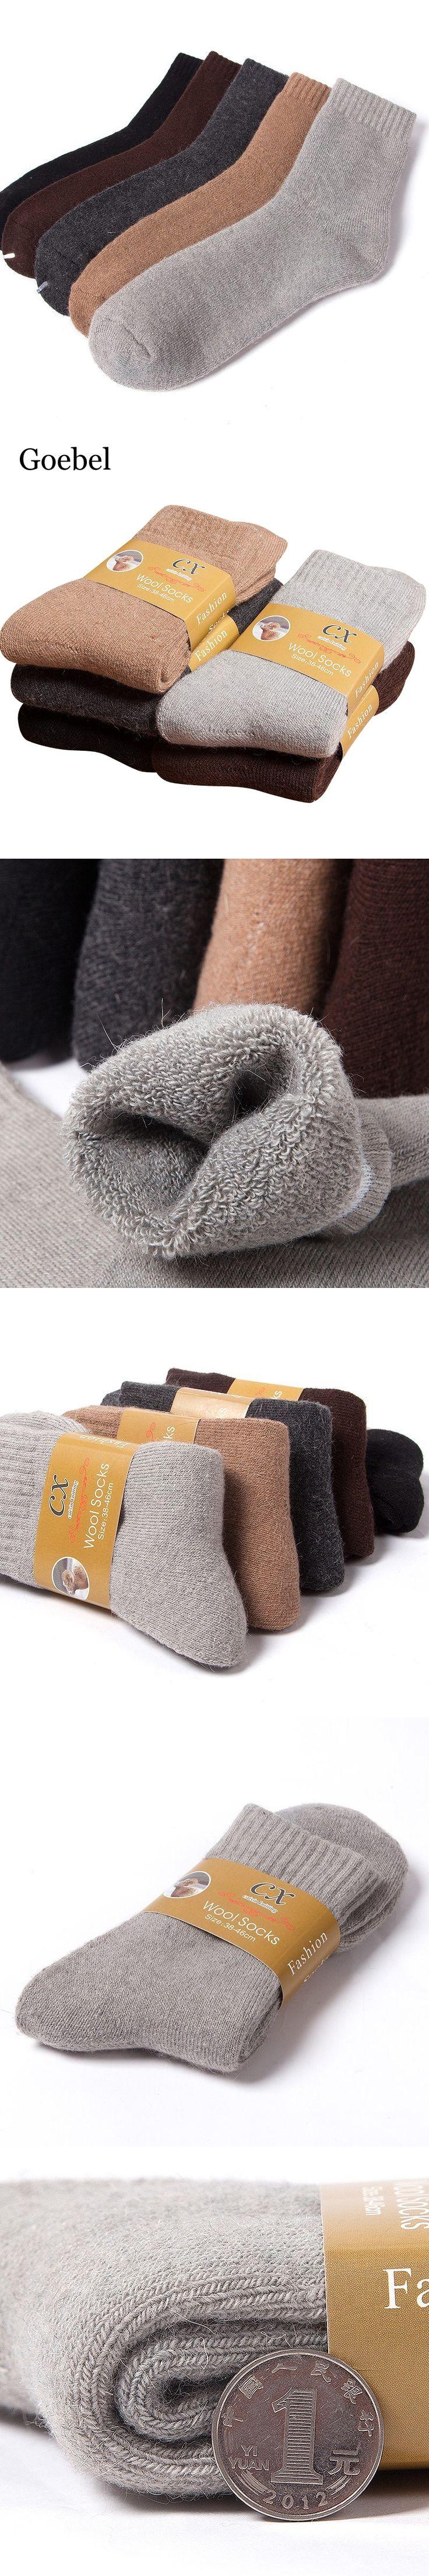 Goebel Man's Winter Socks Comfortable Solid Color Men Thicker Socks Warm Comfortable Man Wool Socks 3pairs/lot